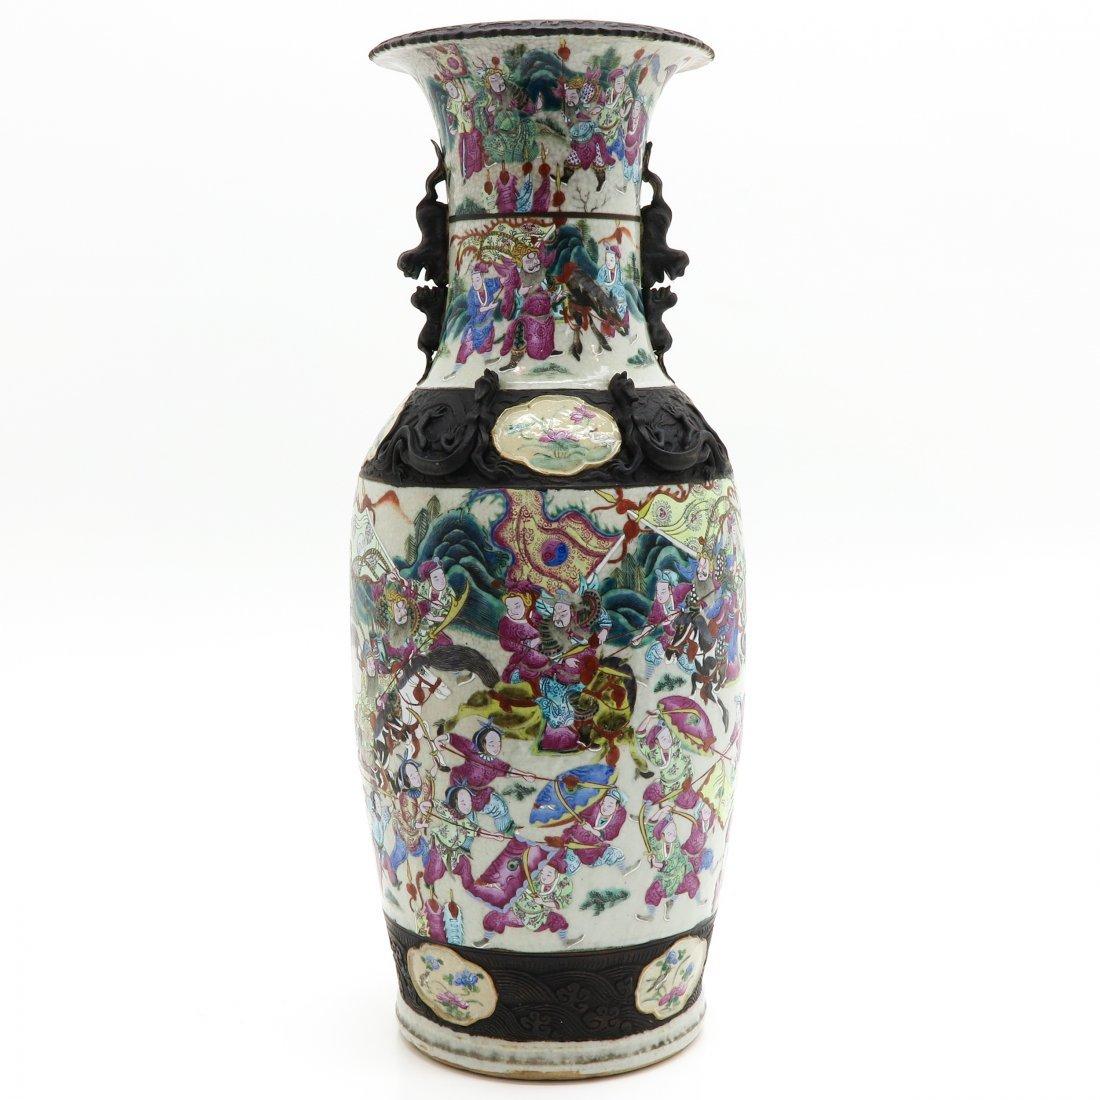 China Porcelain Famille Rose Decor Nanking Vase